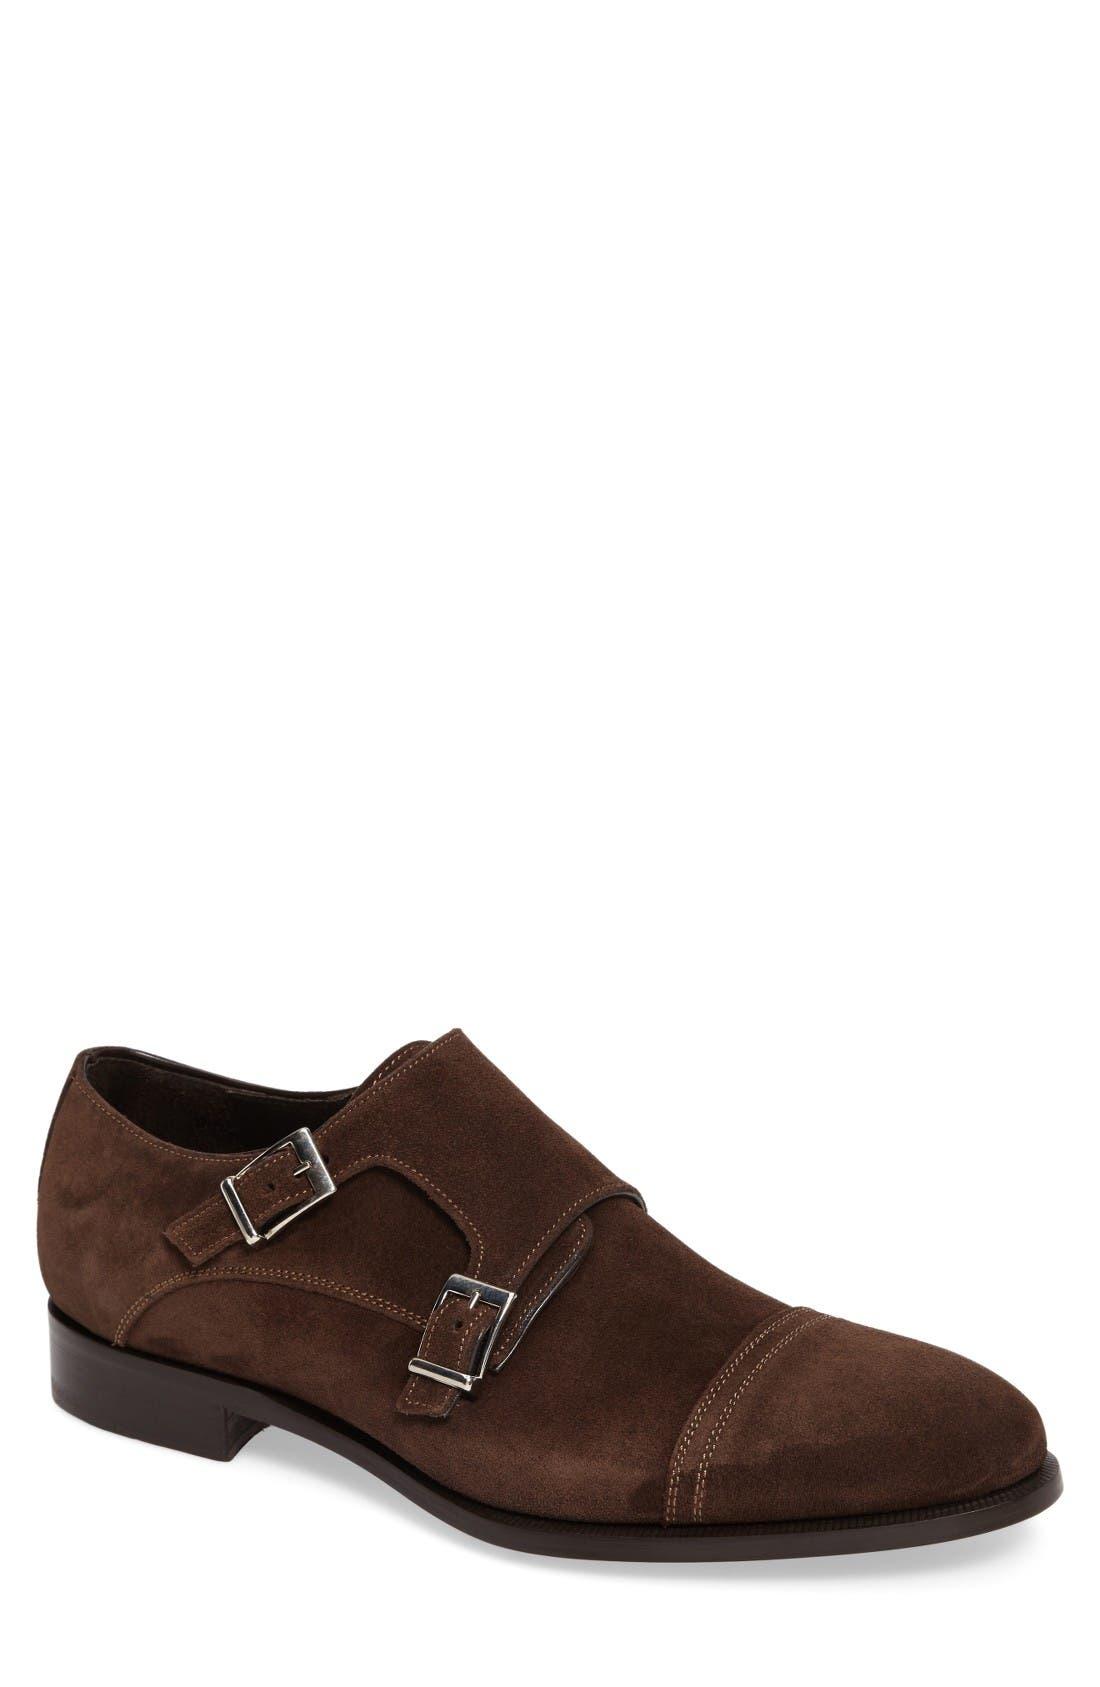 Alternate Image 1 Selected - Crosby Square Conley Double Monk Strap Shoe (Men)